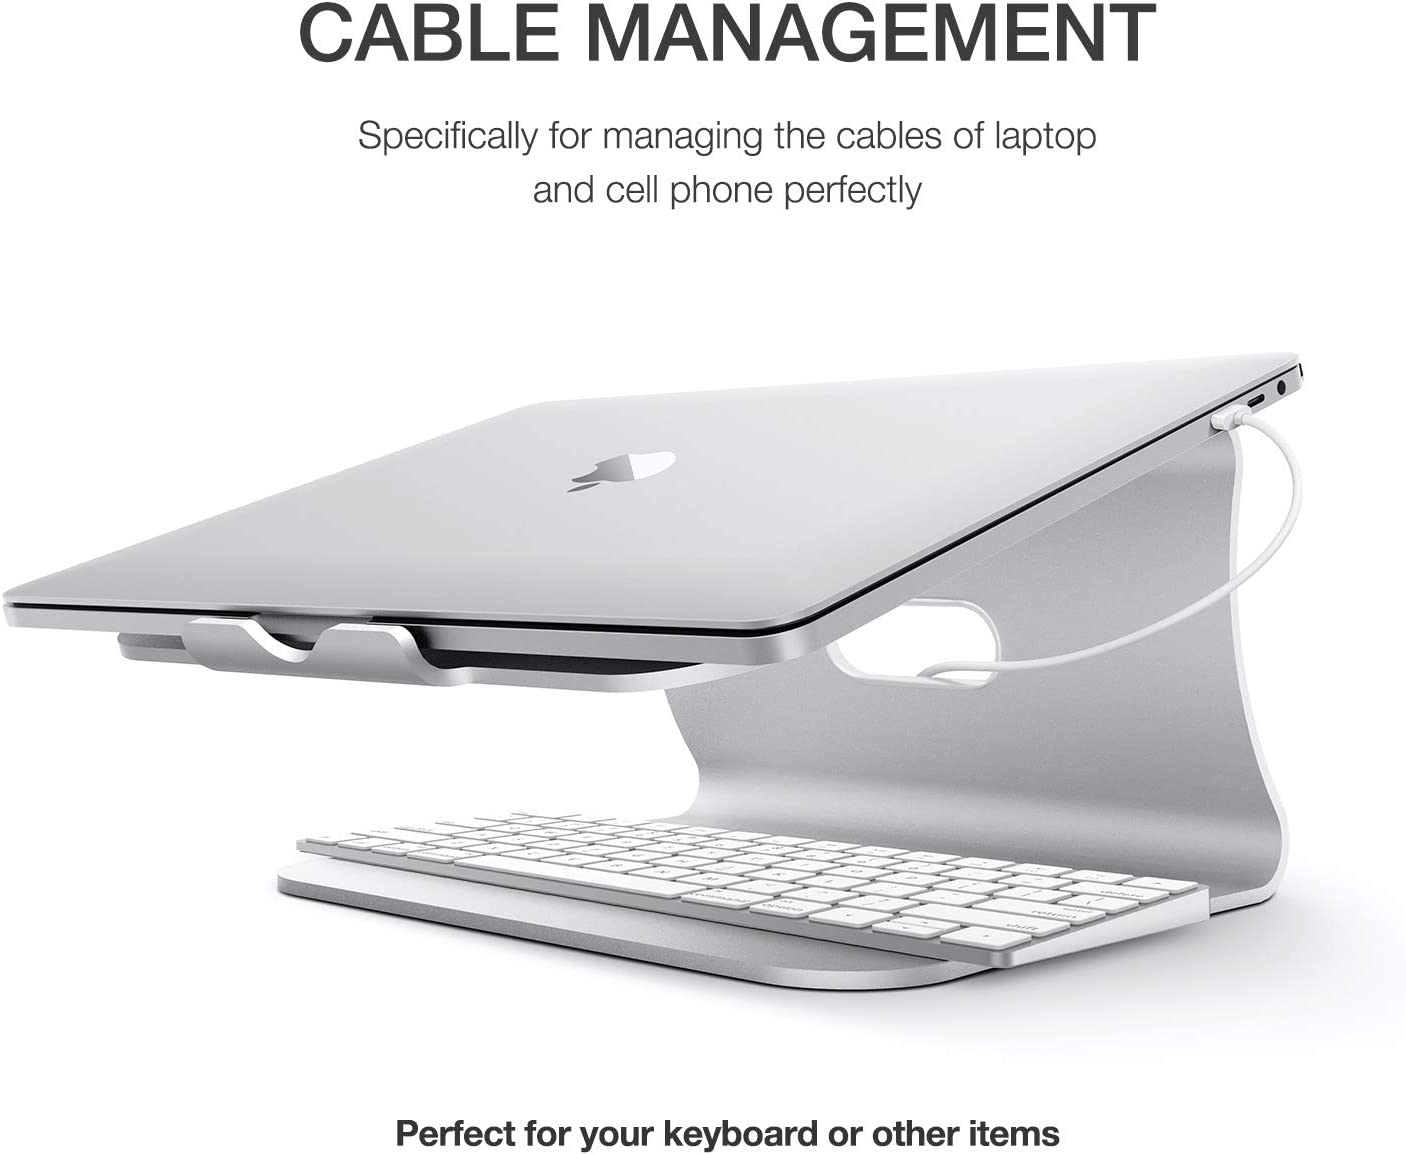 MacBook Pro Patented Sliver Ergonomic Aluminum Cooling Desktop Stand for MacBook Mount Holder for Apple MacBook Air Bestand Laptop Stand All 11-16 Laptop